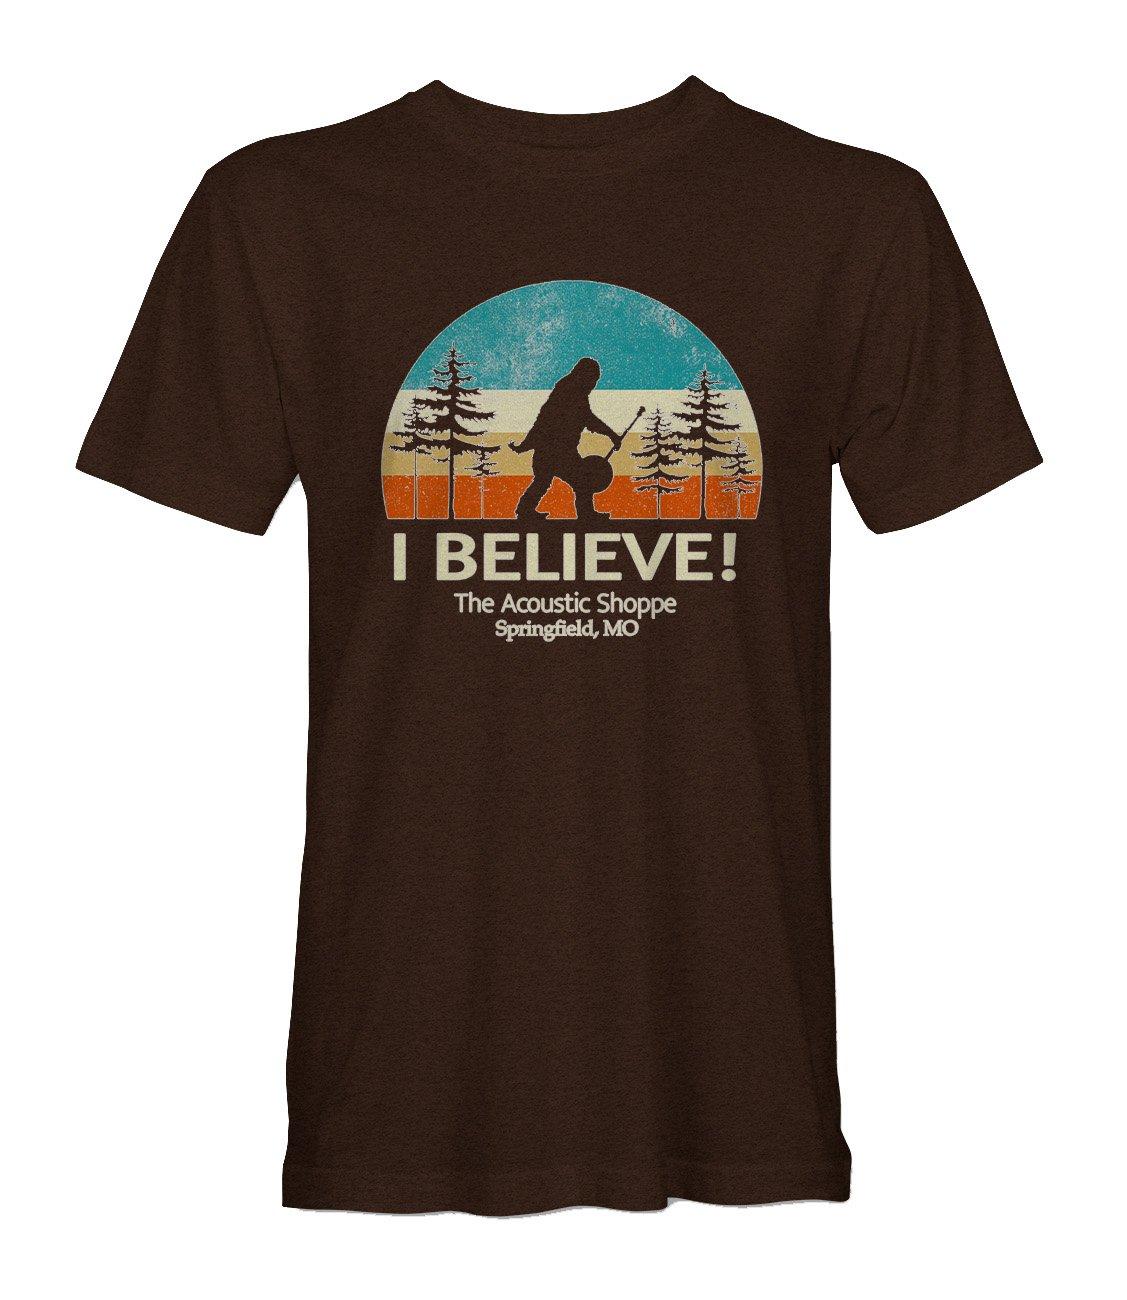 The Acoustic Shoppe Bigfoot design T-Shirt (Brown)